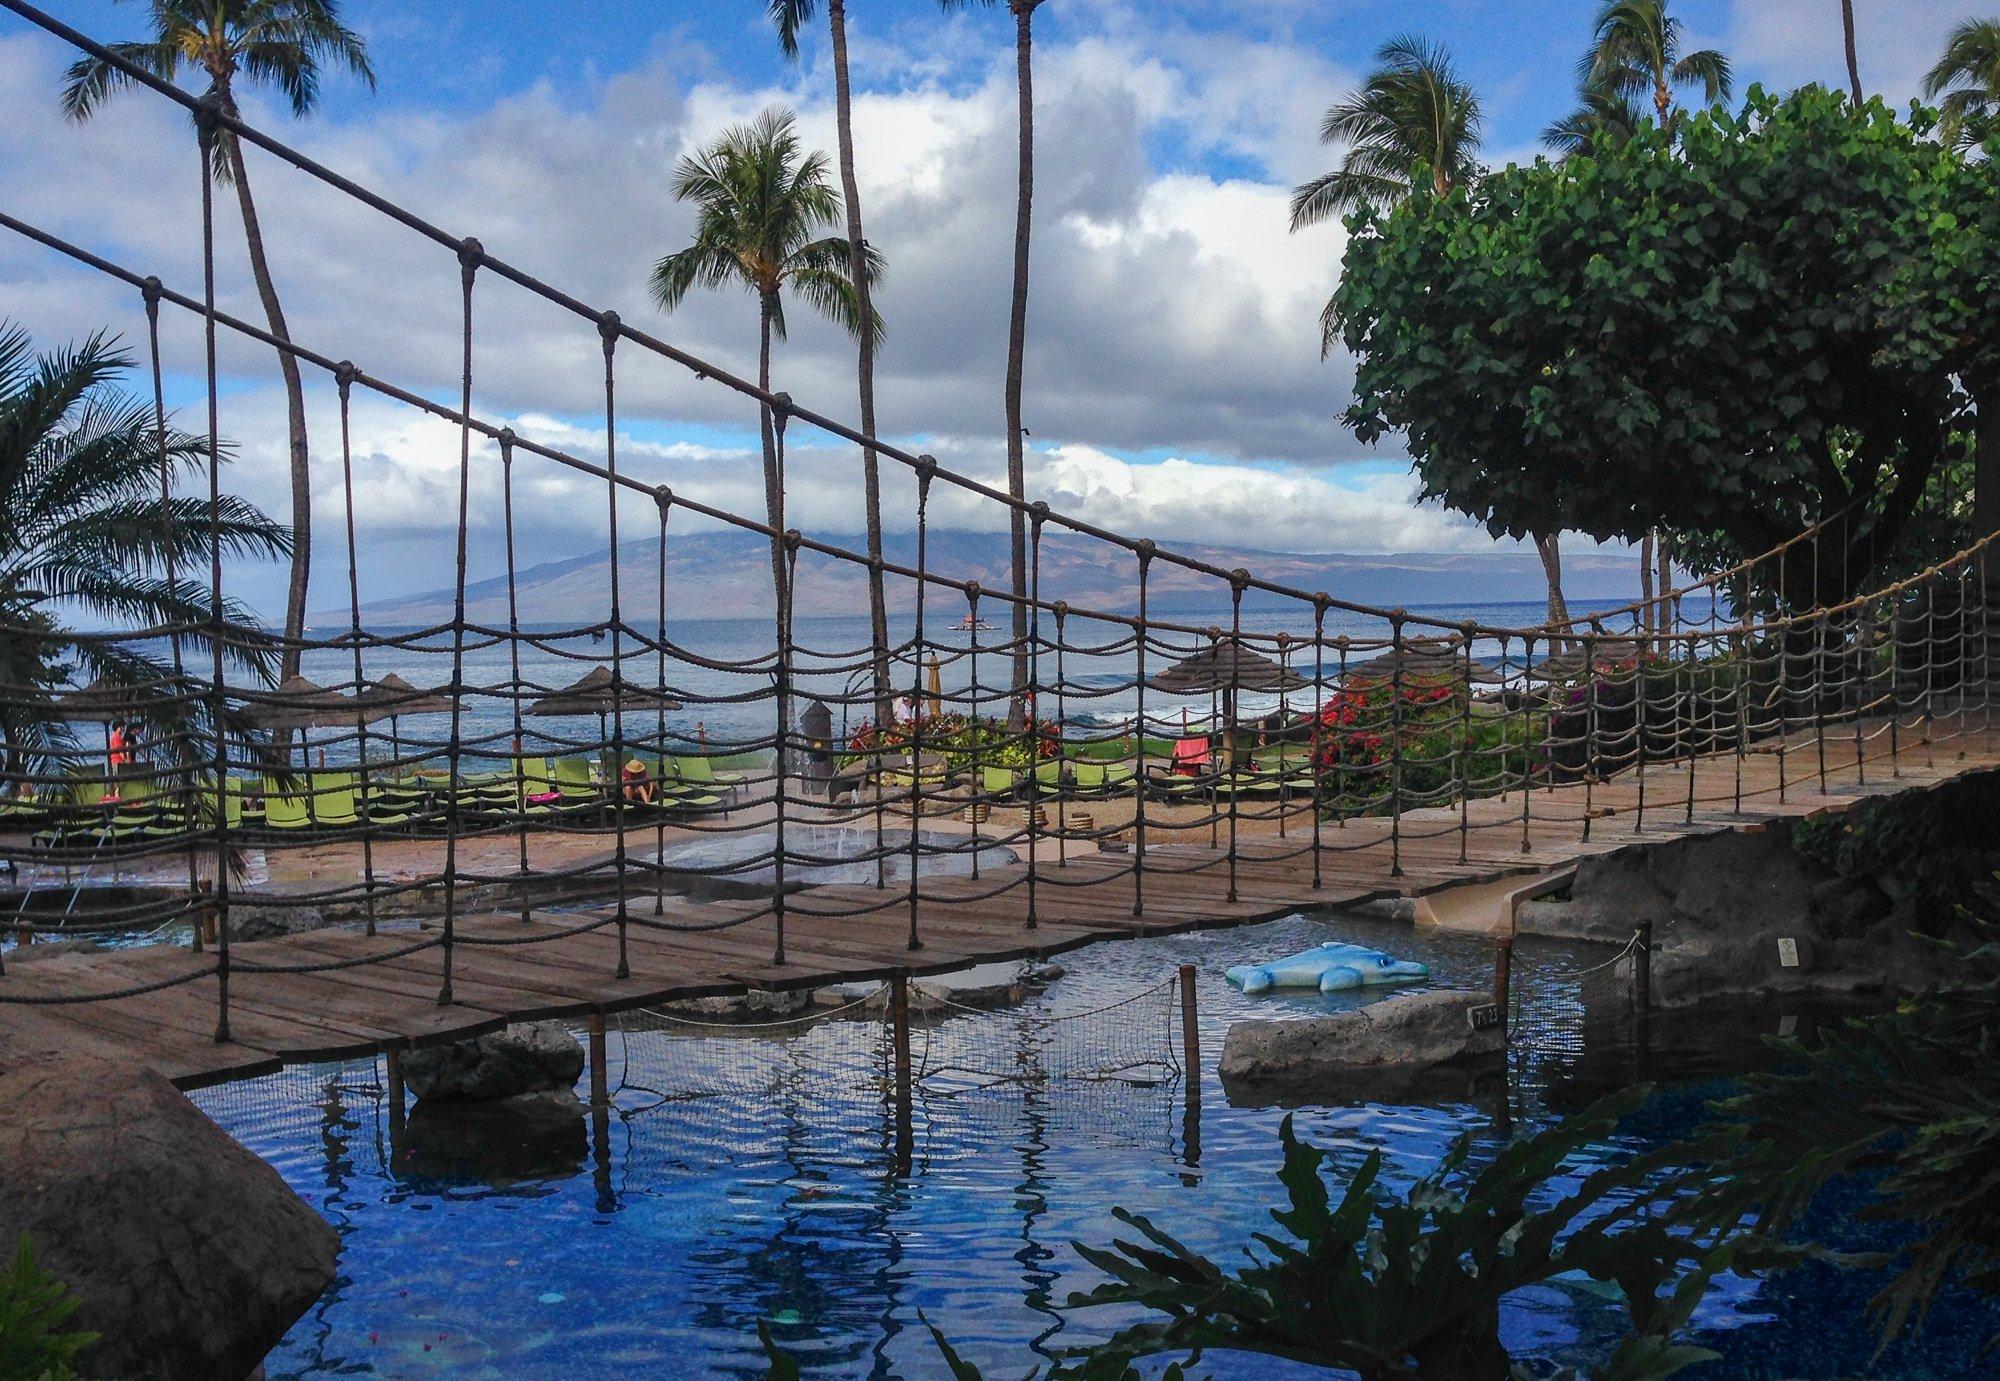 Rope bridge at Hyatt Regency Maui Resort and Spa